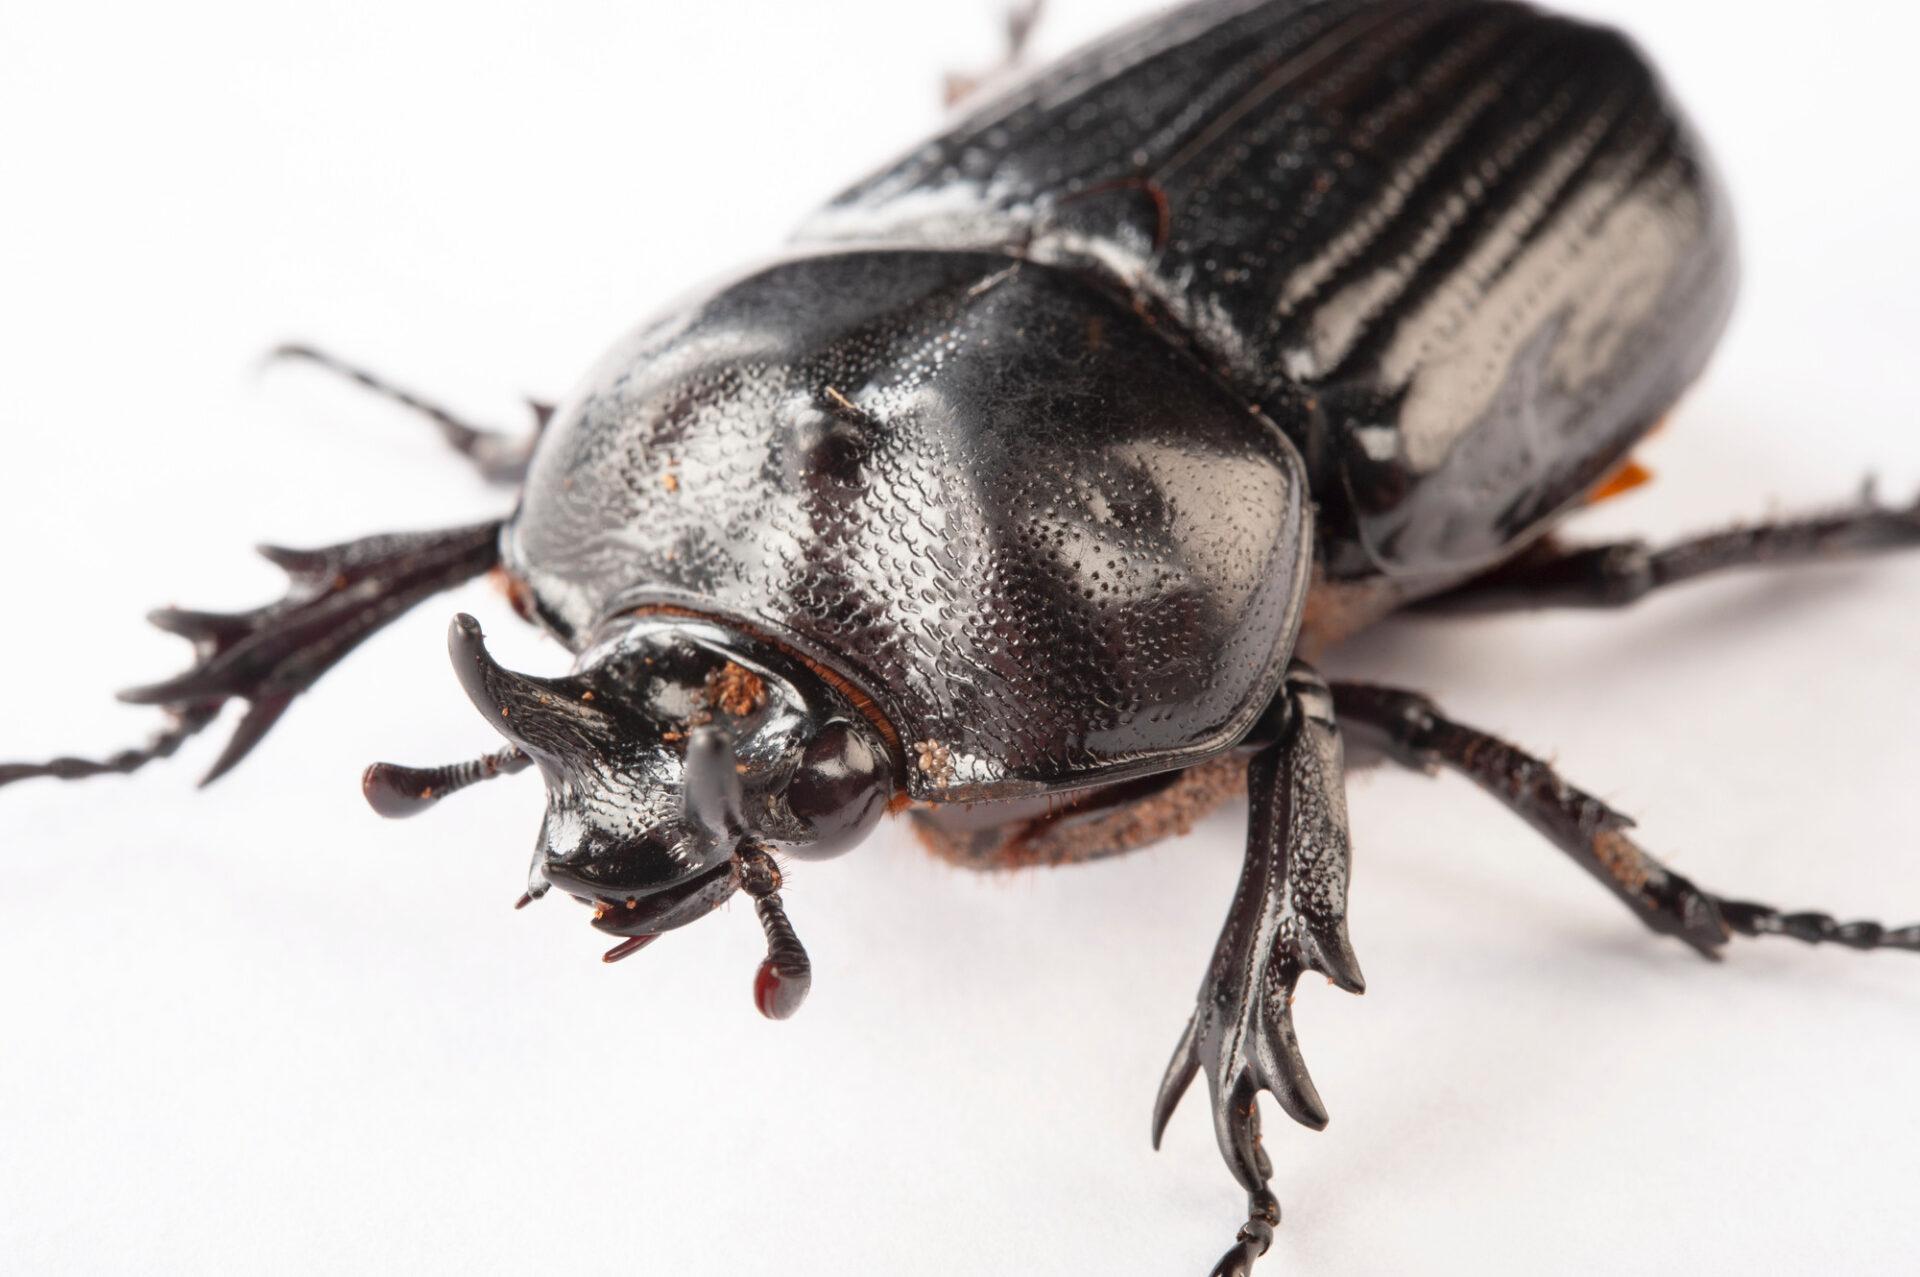 Photo: Triceratops beetle (Phileurus truncatus) at the Insectarium in New Orleans.